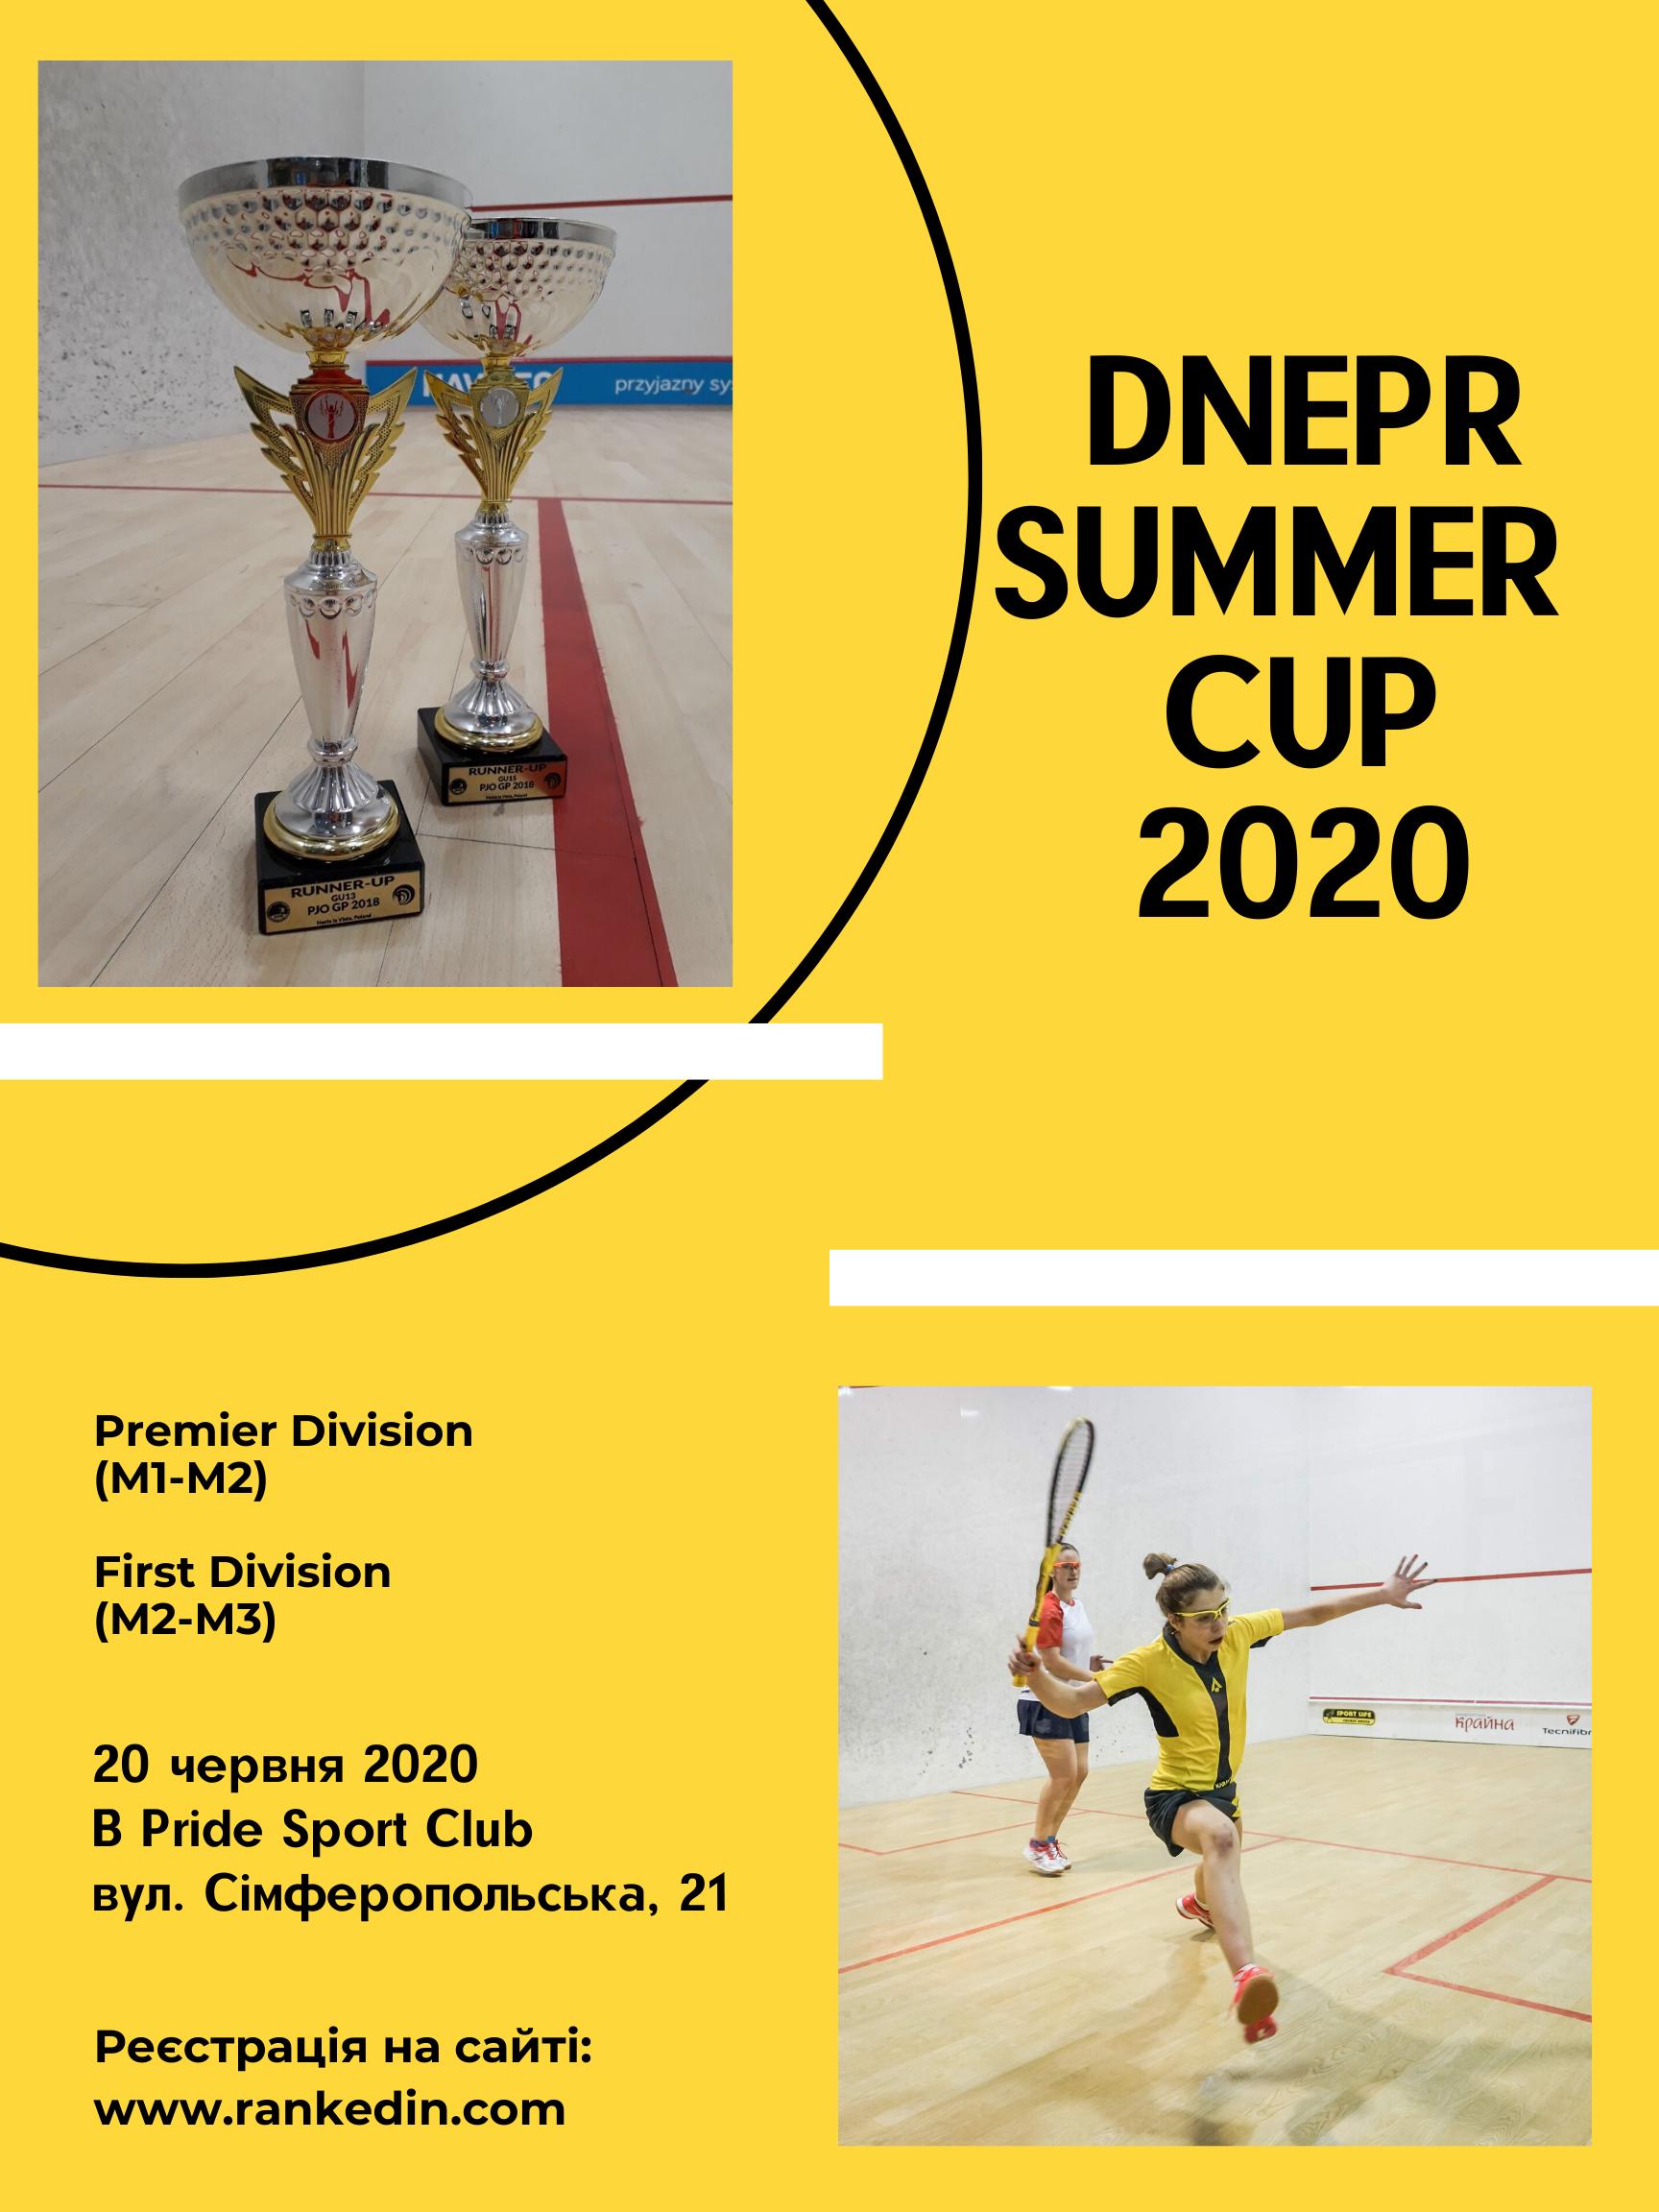 Dnepr Summer Cup 2020